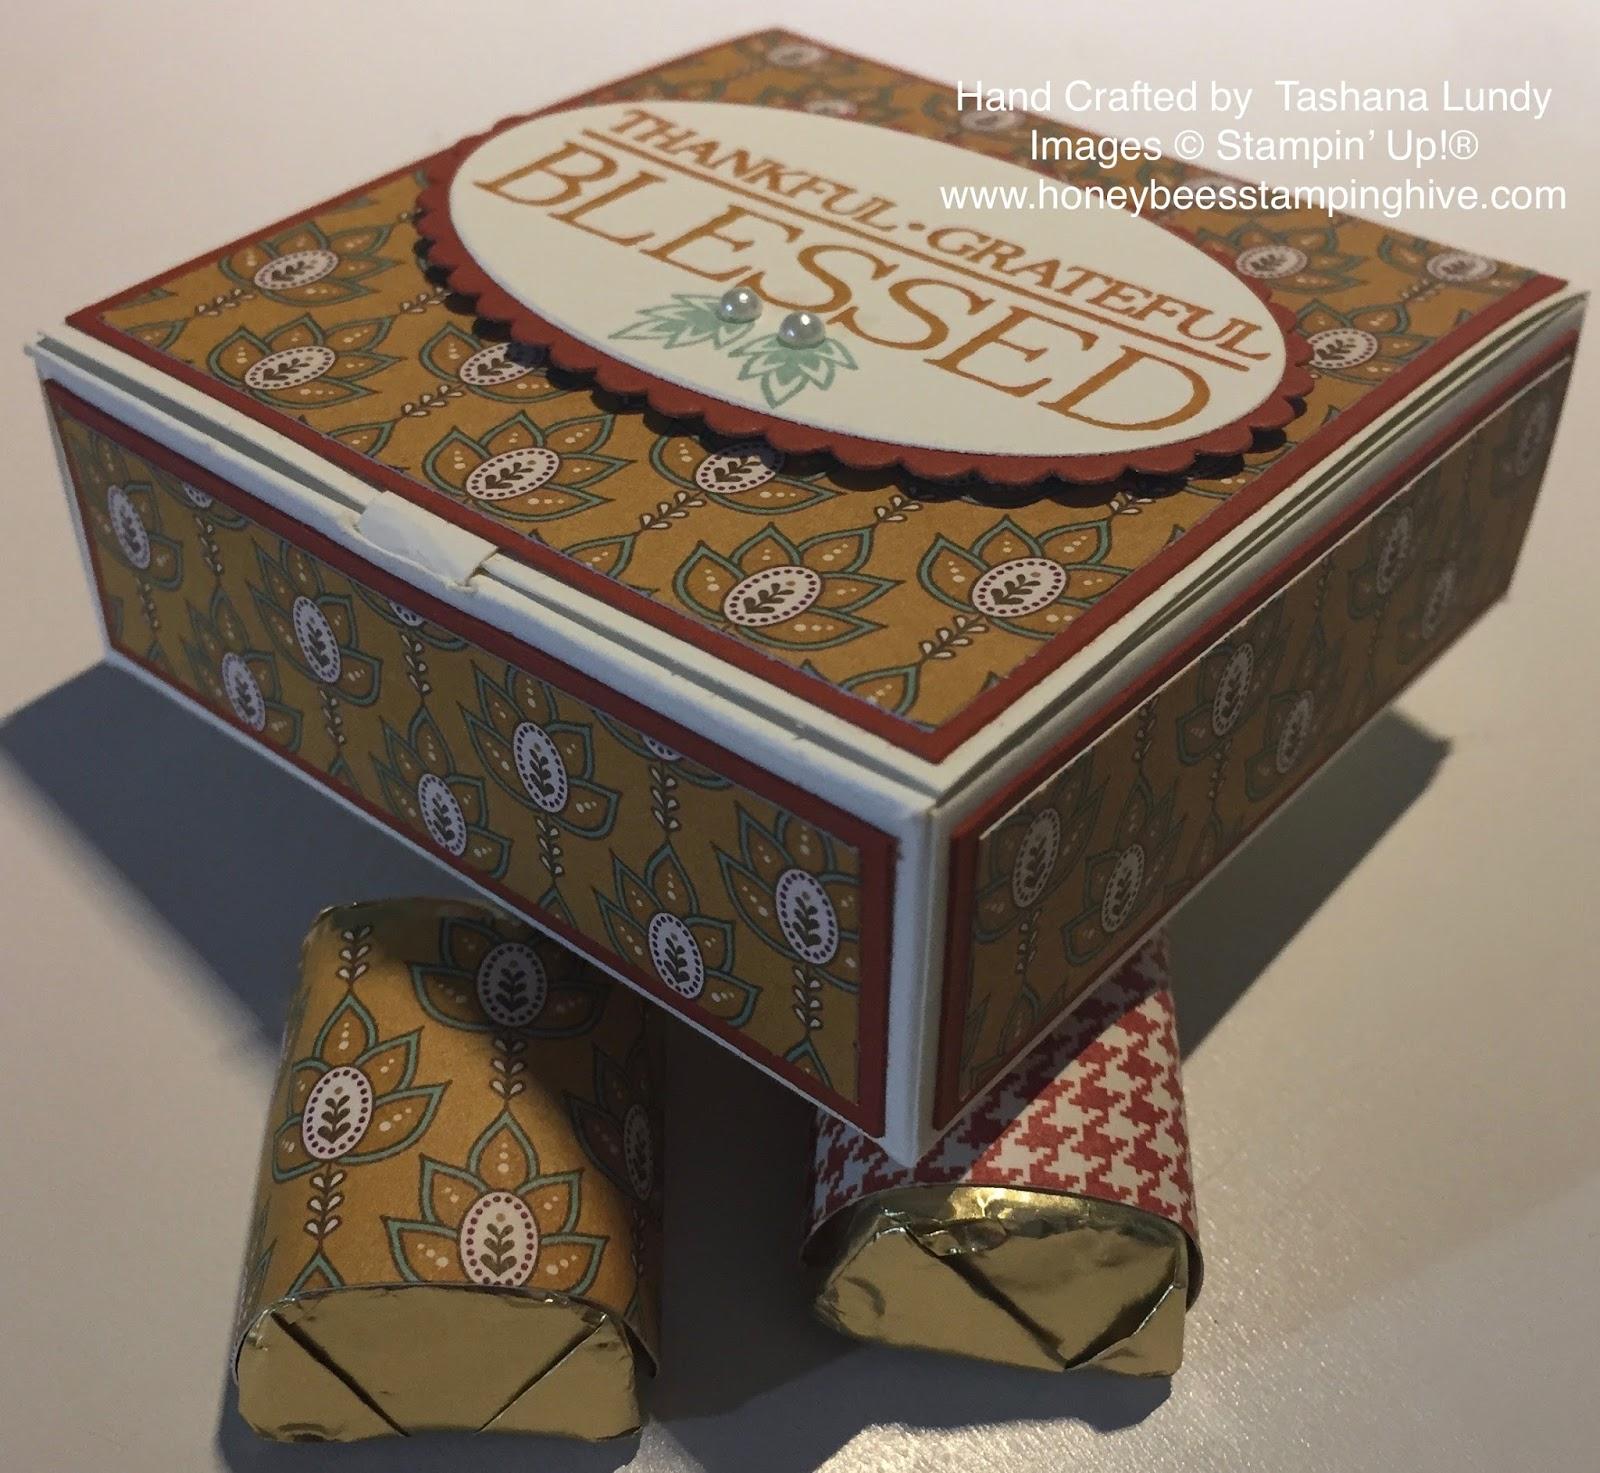 Honeybee's Stamping Hive: Hershey Nugget Card Box